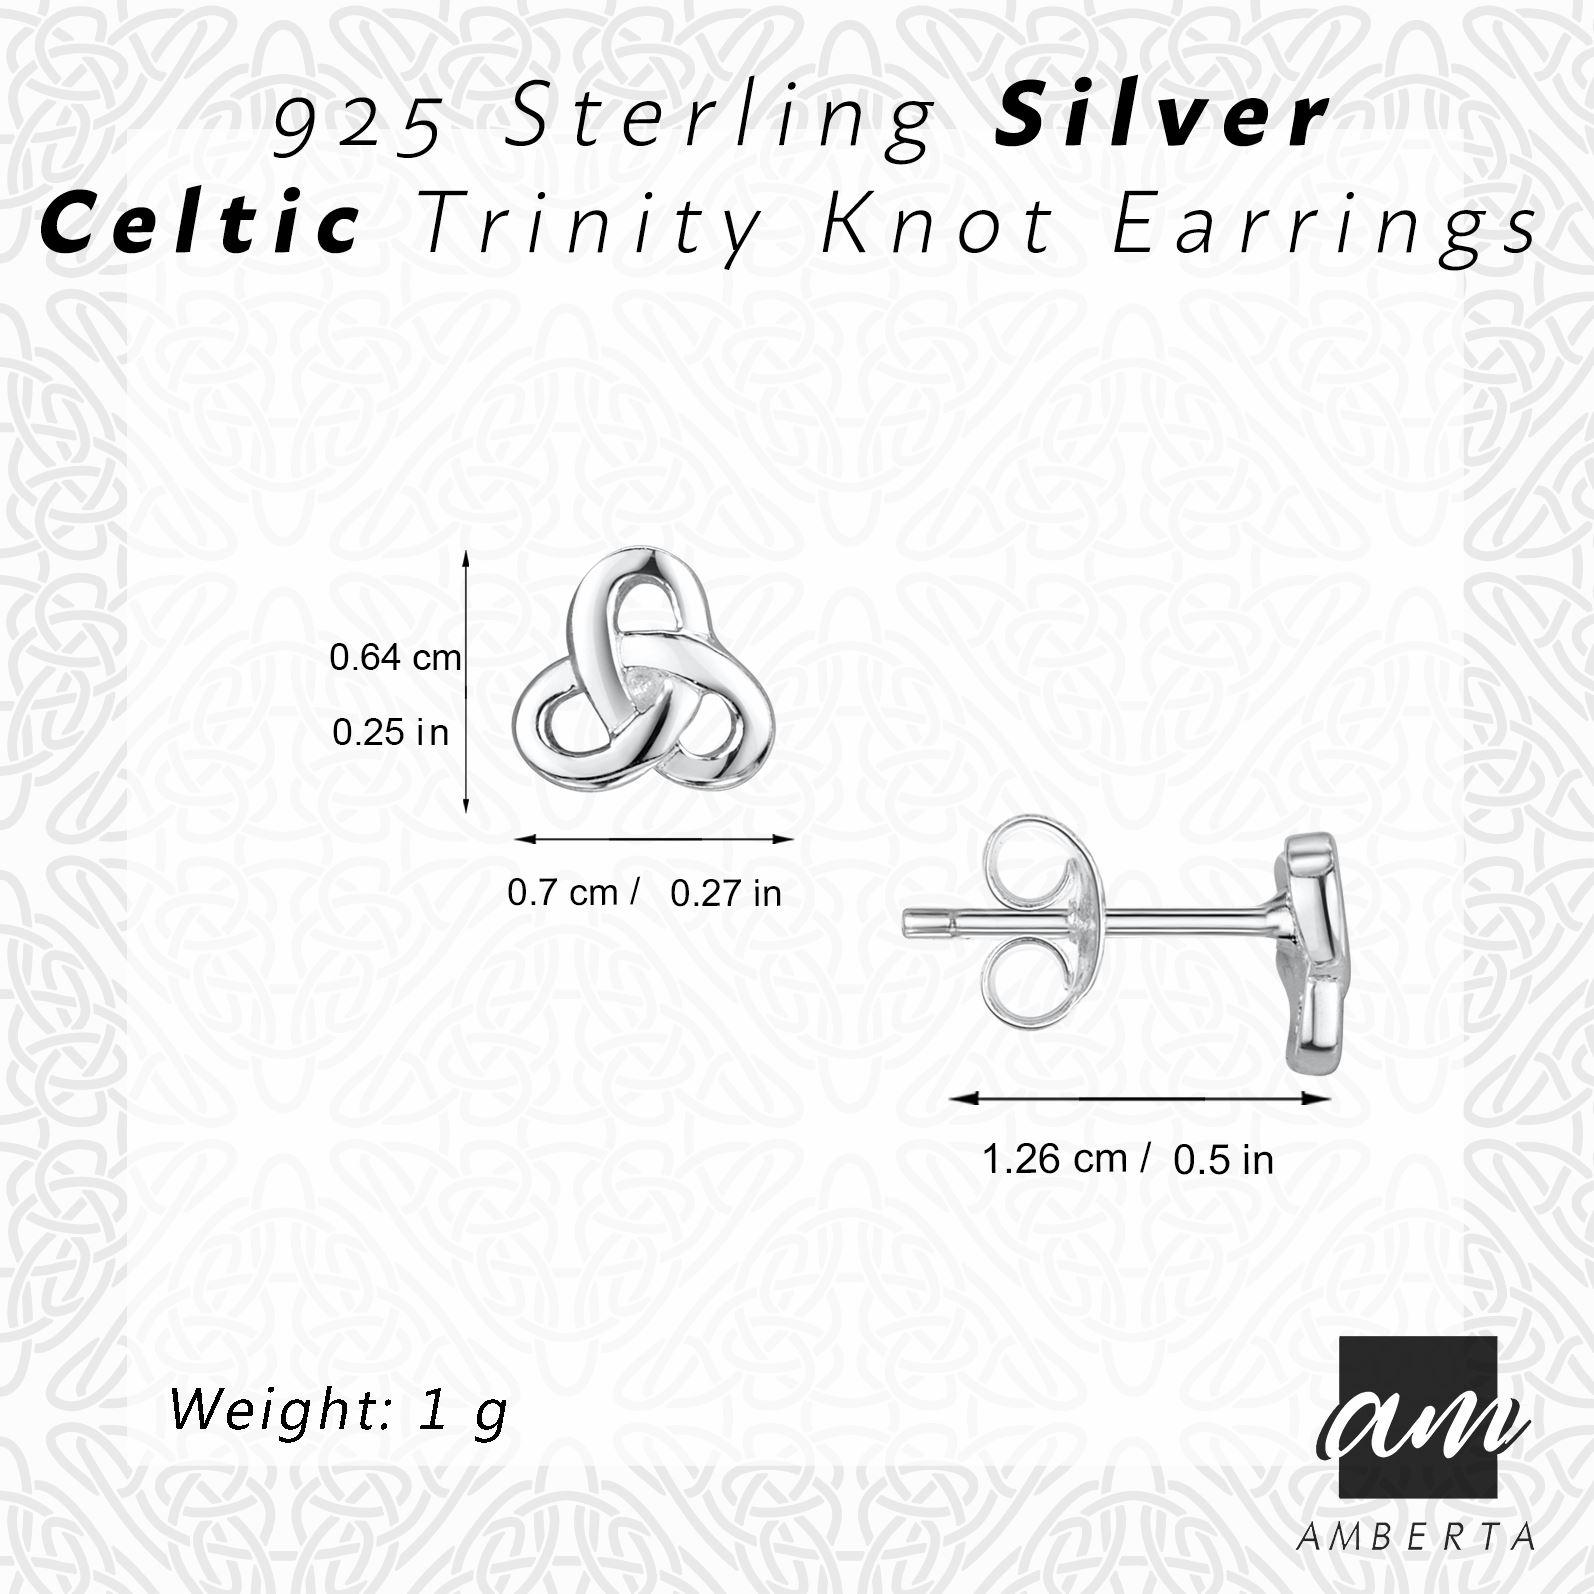 Amberta-925-Sterling-Silver-Celtic-Knot-Earrings-for-Women-Irish-Design miniature 33